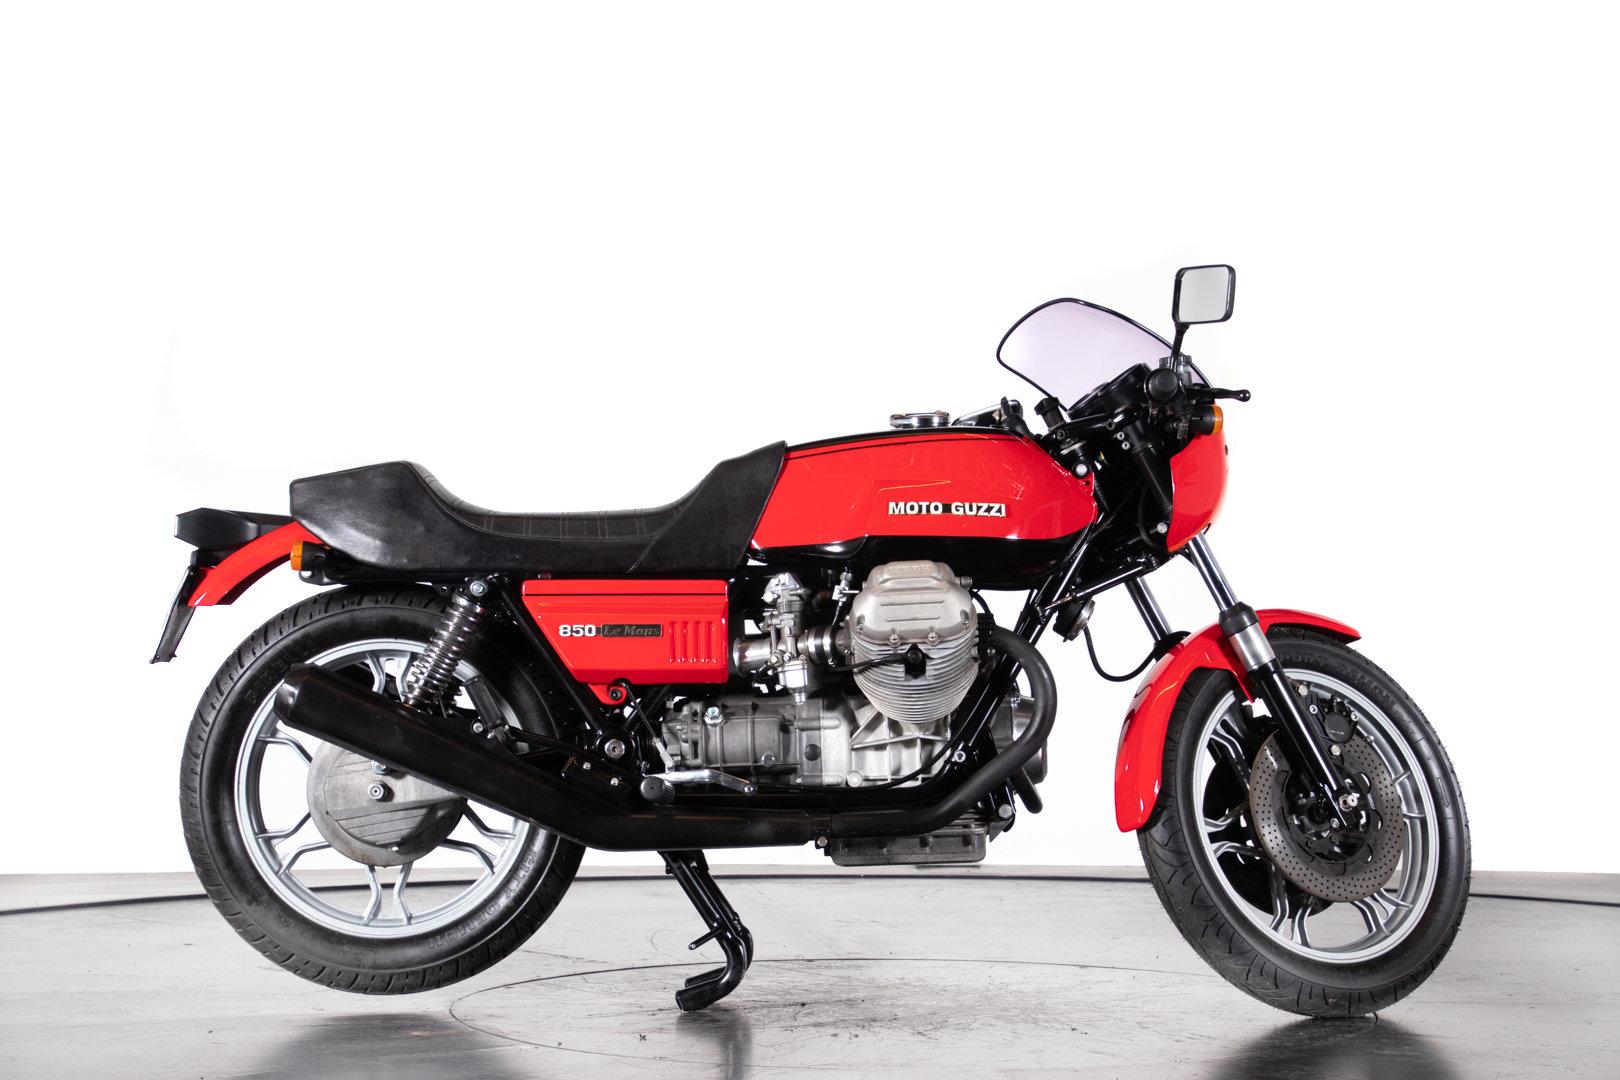 MOTO GUZZI - 850 LE MANS - 1977 For Sale (picture 2 of 6)